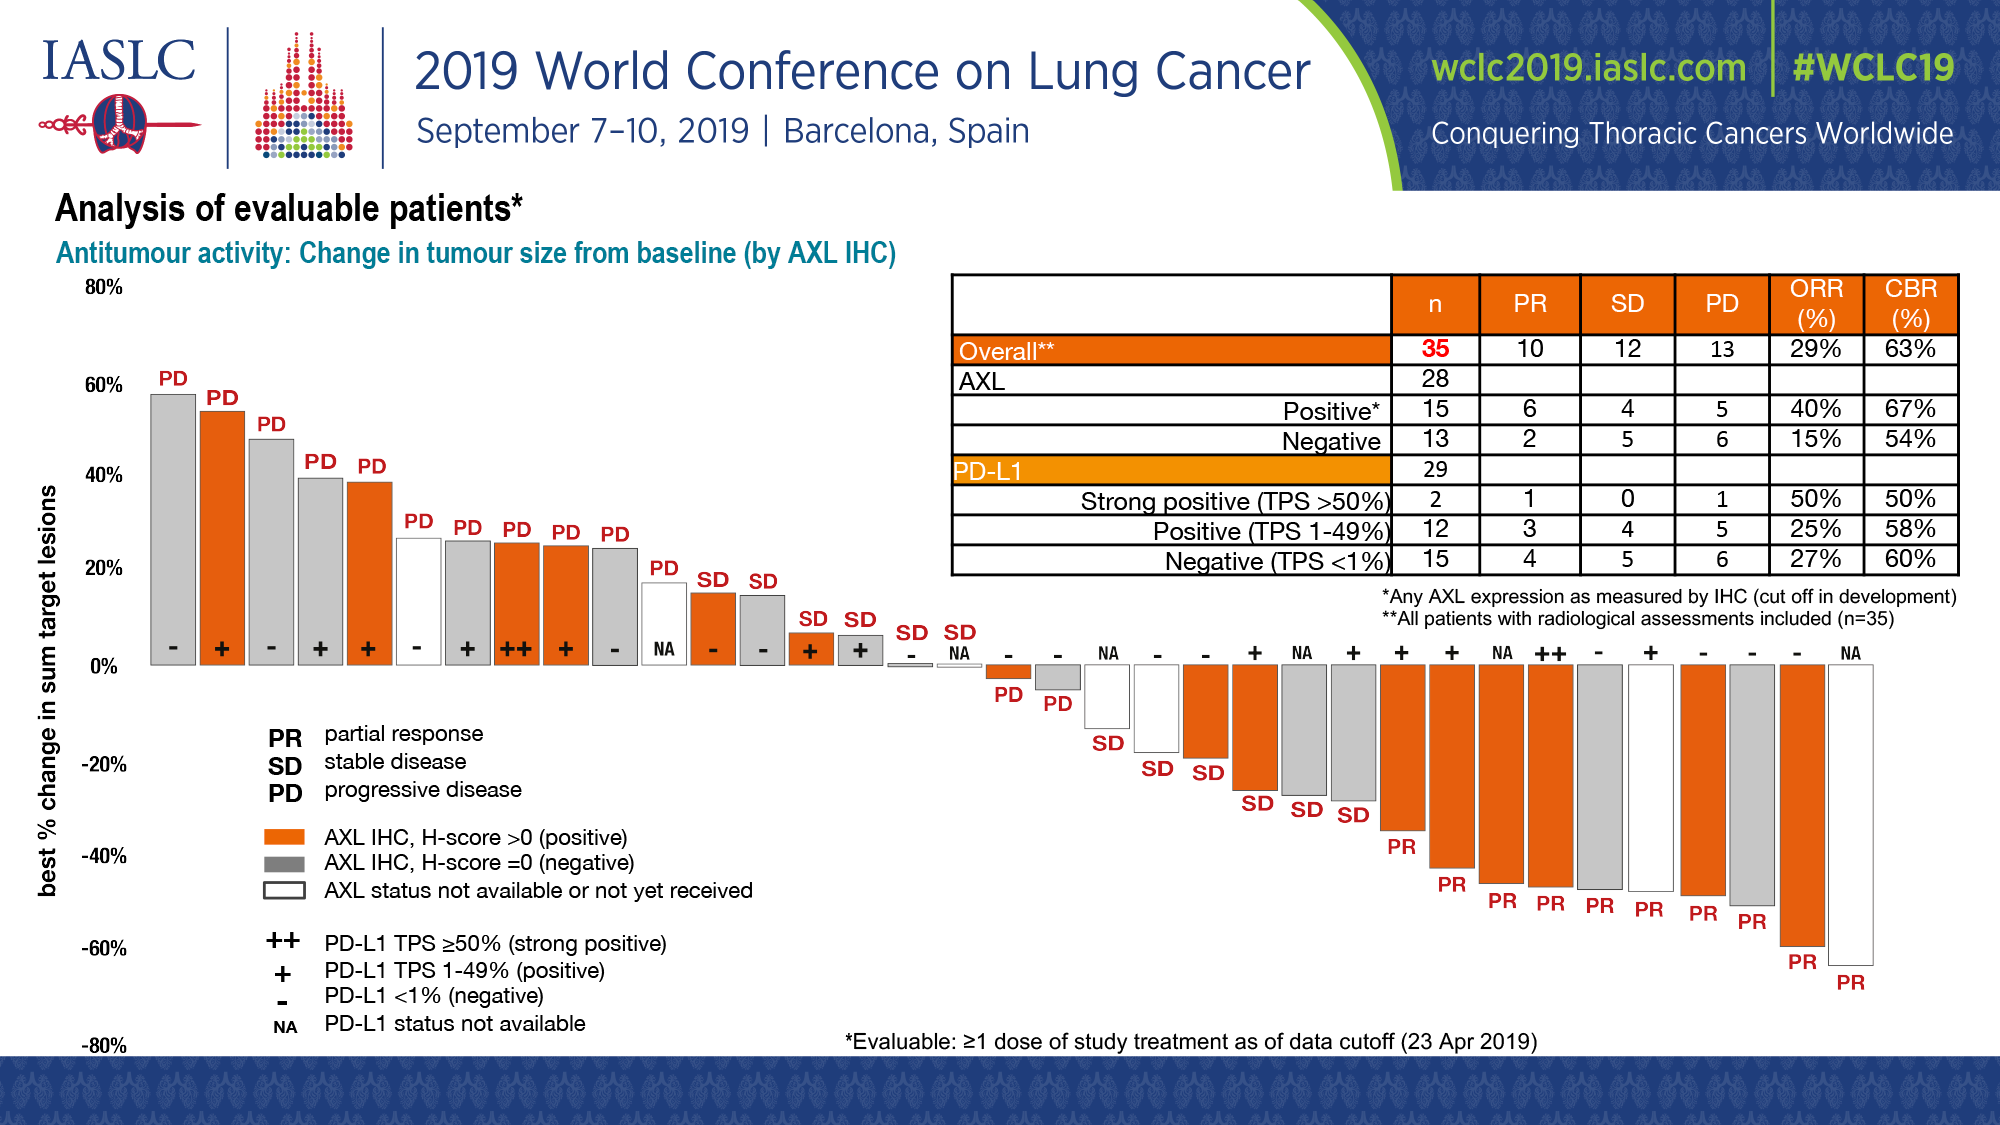 bemcentinib nct03184571 results 01 - Бемцентиниб: свежее открытие таргетной онкотерапии